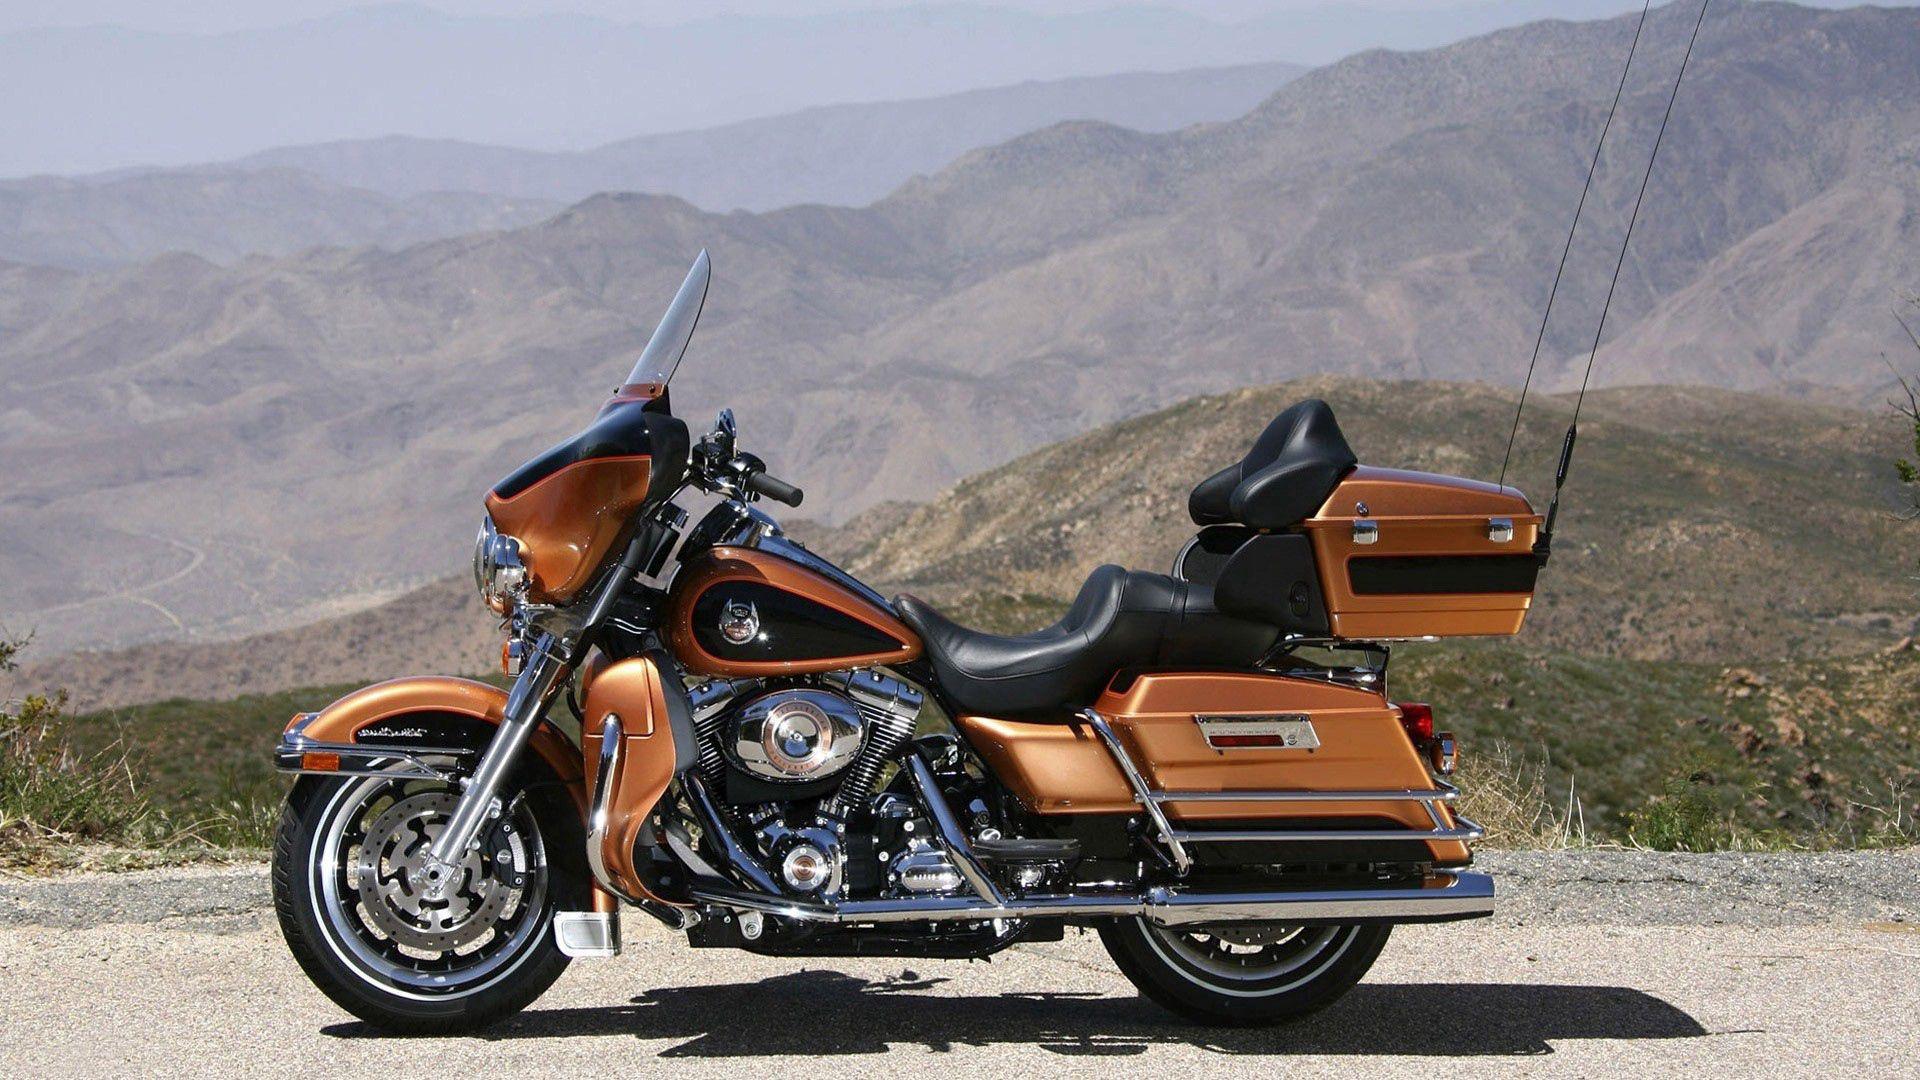 70671 Заставки и Обои Мотоциклы на телефон. Скачать Мотоциклы, Мотоцикл, Вид, Harley Davidson, Мото, Bike картинки бесплатно